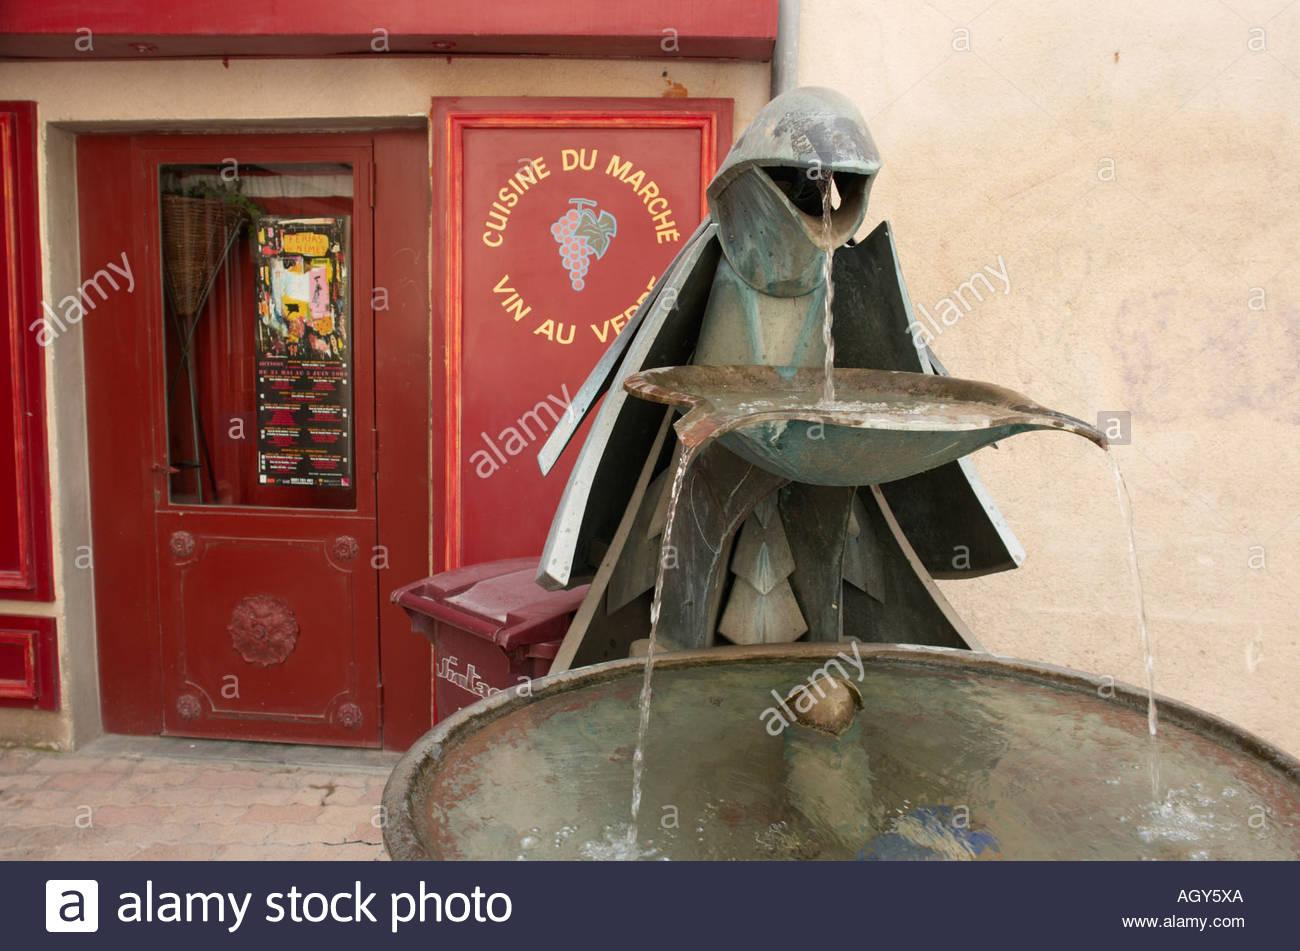 Stylised modern bronze fountain/ sculpture outside the Cuisine de Marche restaurnt, Nimes, Gard, Langedoc-Roussilion, France - Stock Image